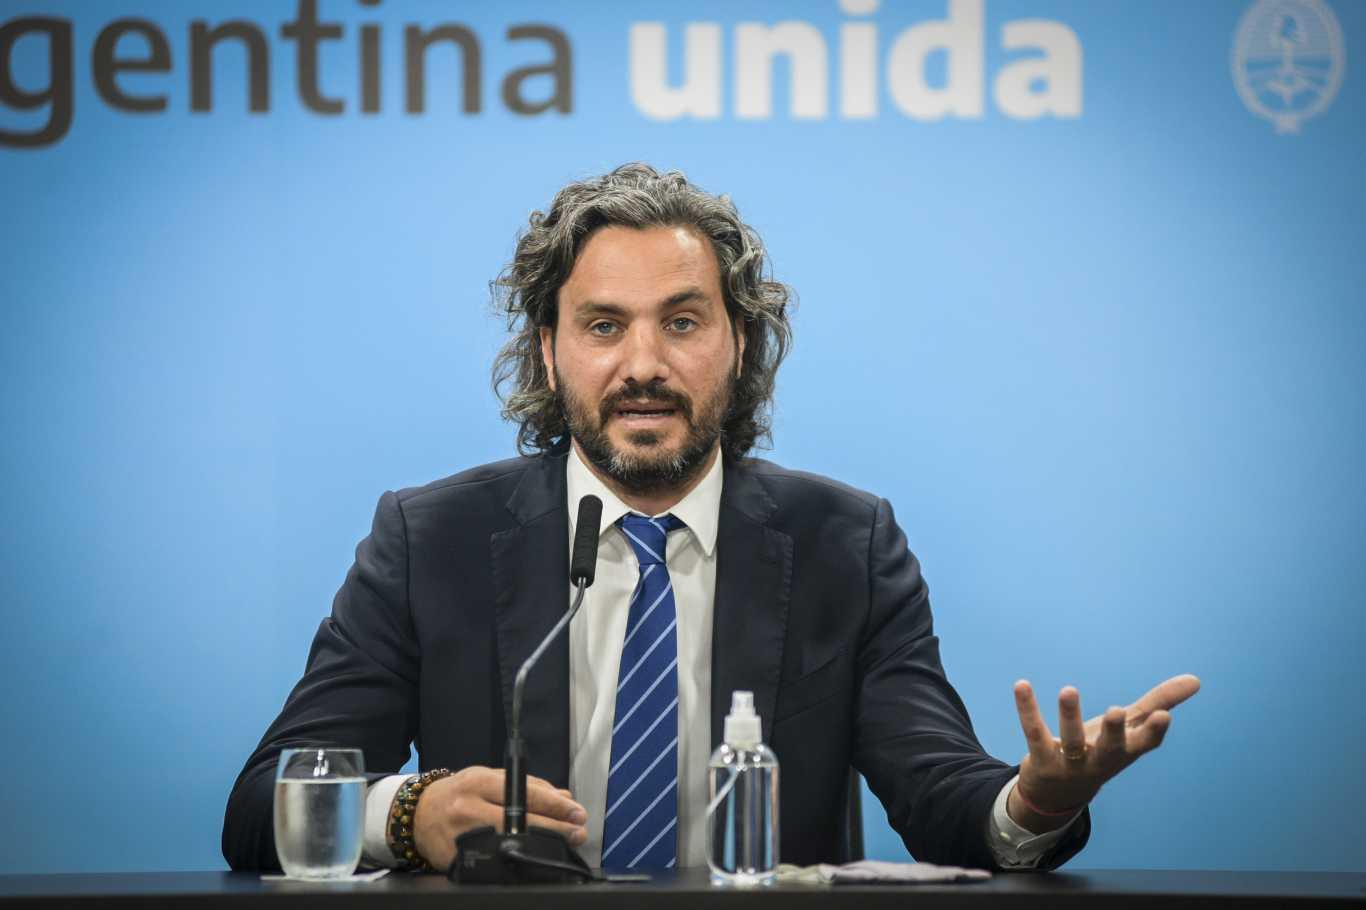 Santiago-Cafiero-3101